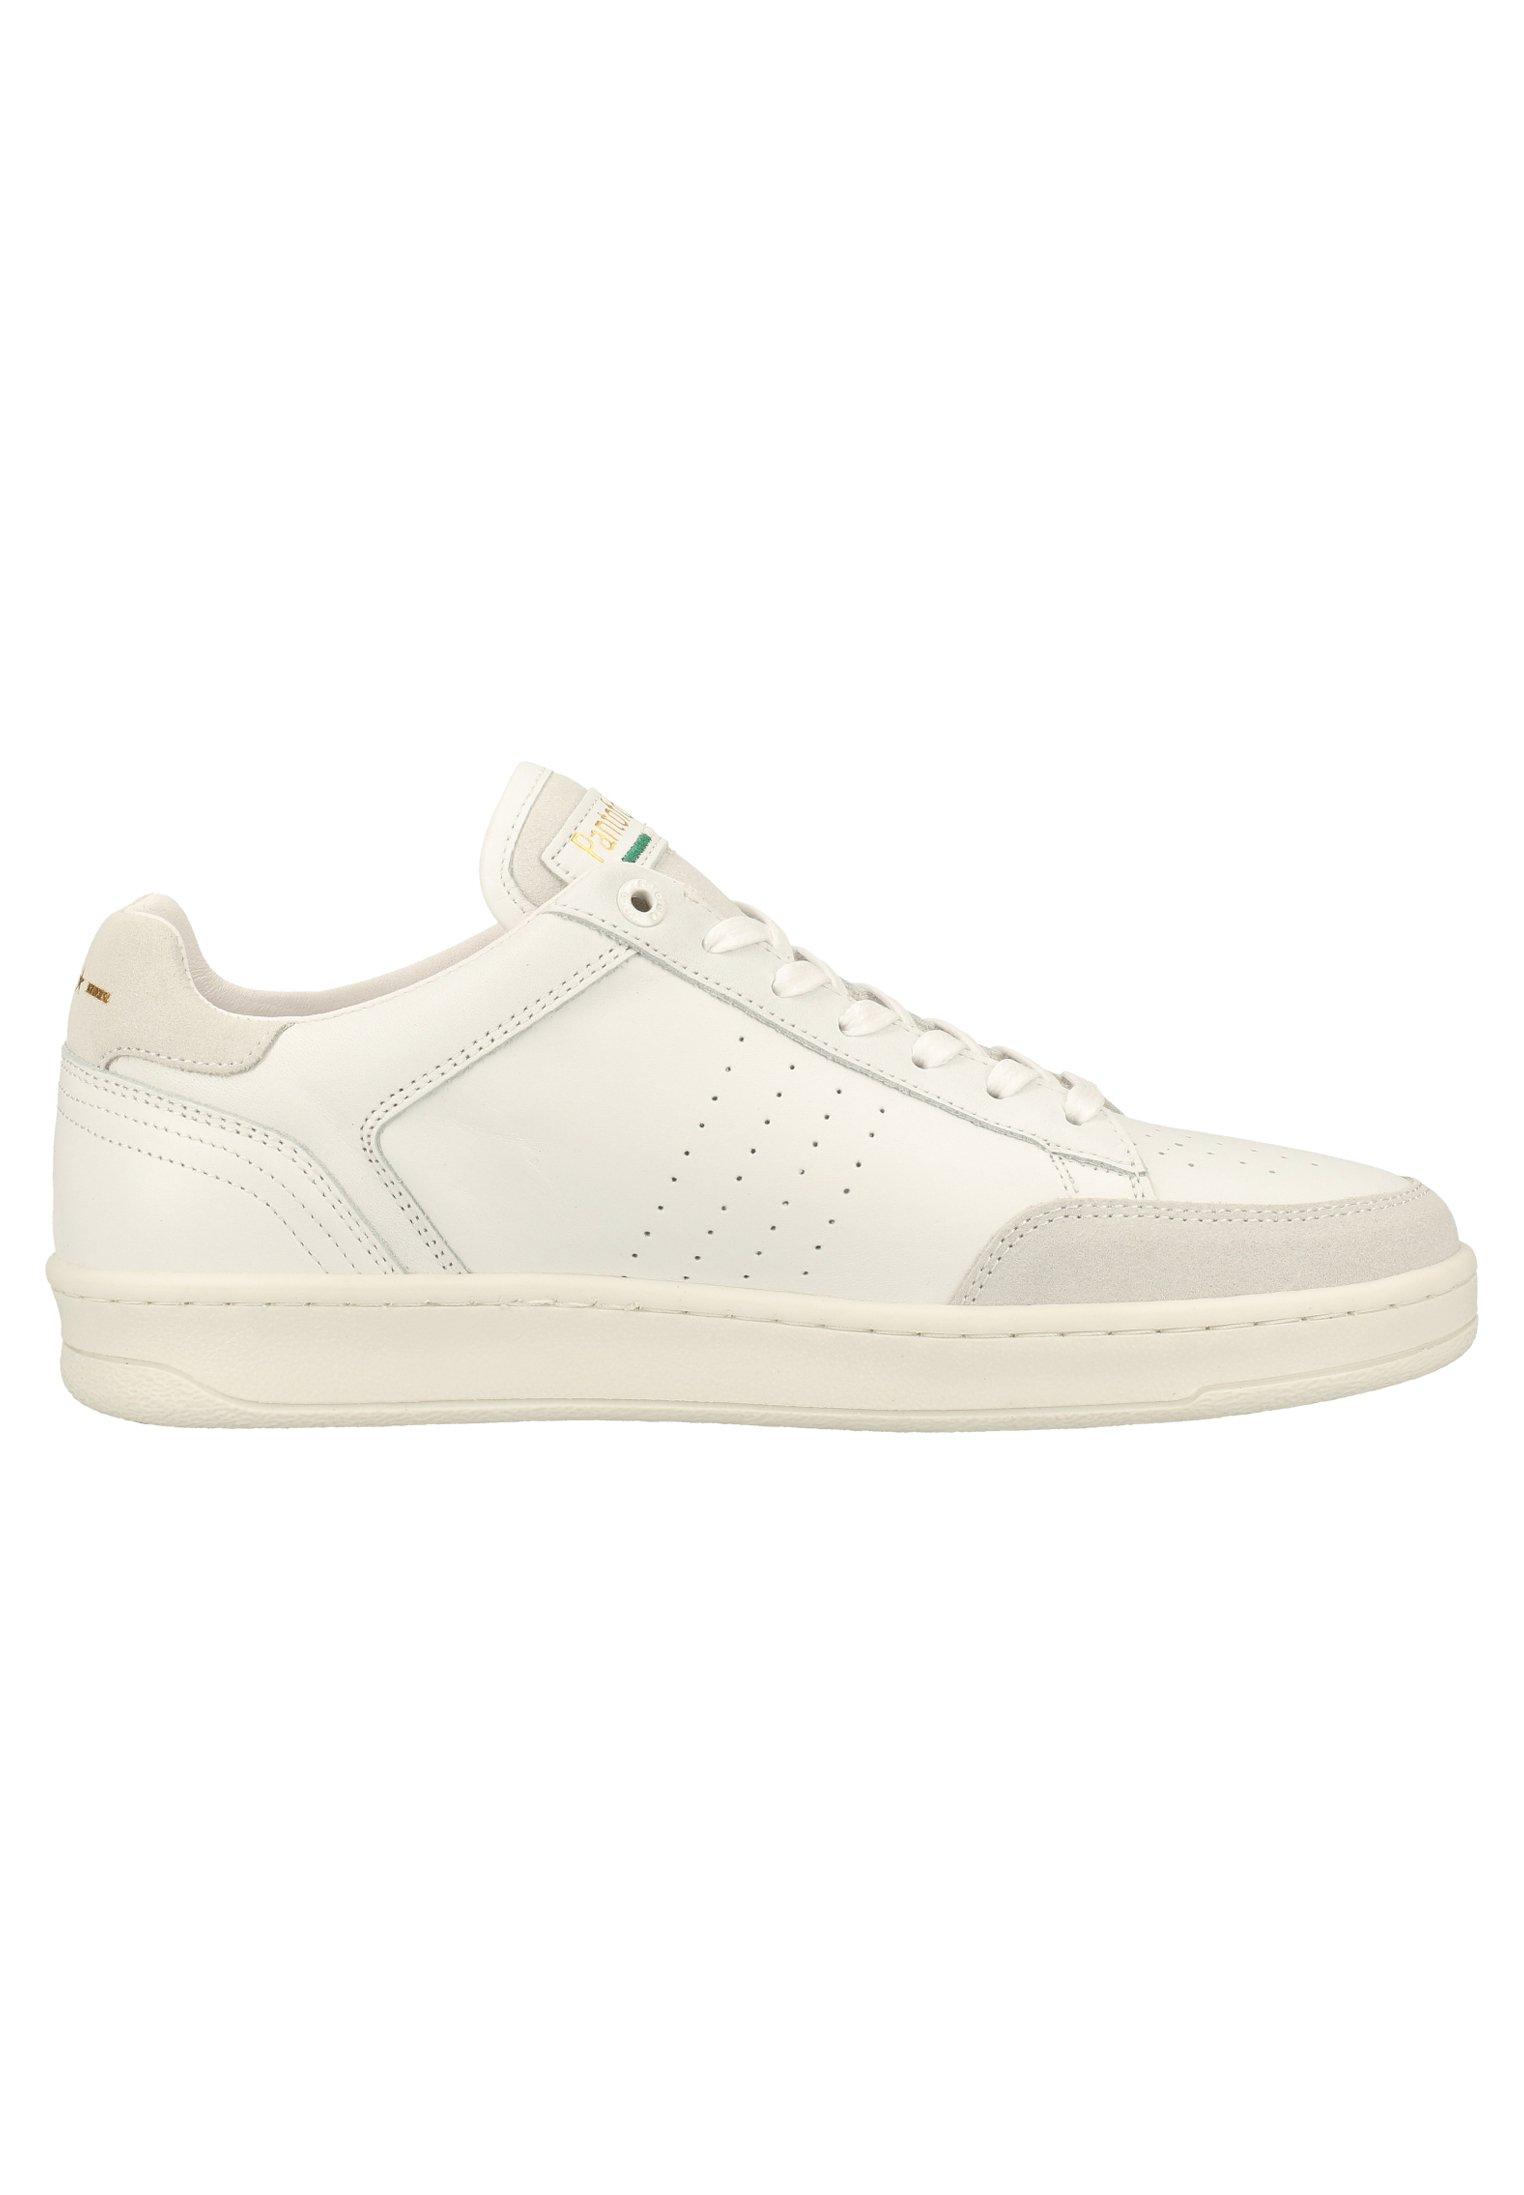 Pantofola dOro Sneaker low - bright white/weiß - Herrenschuhe rjqmw